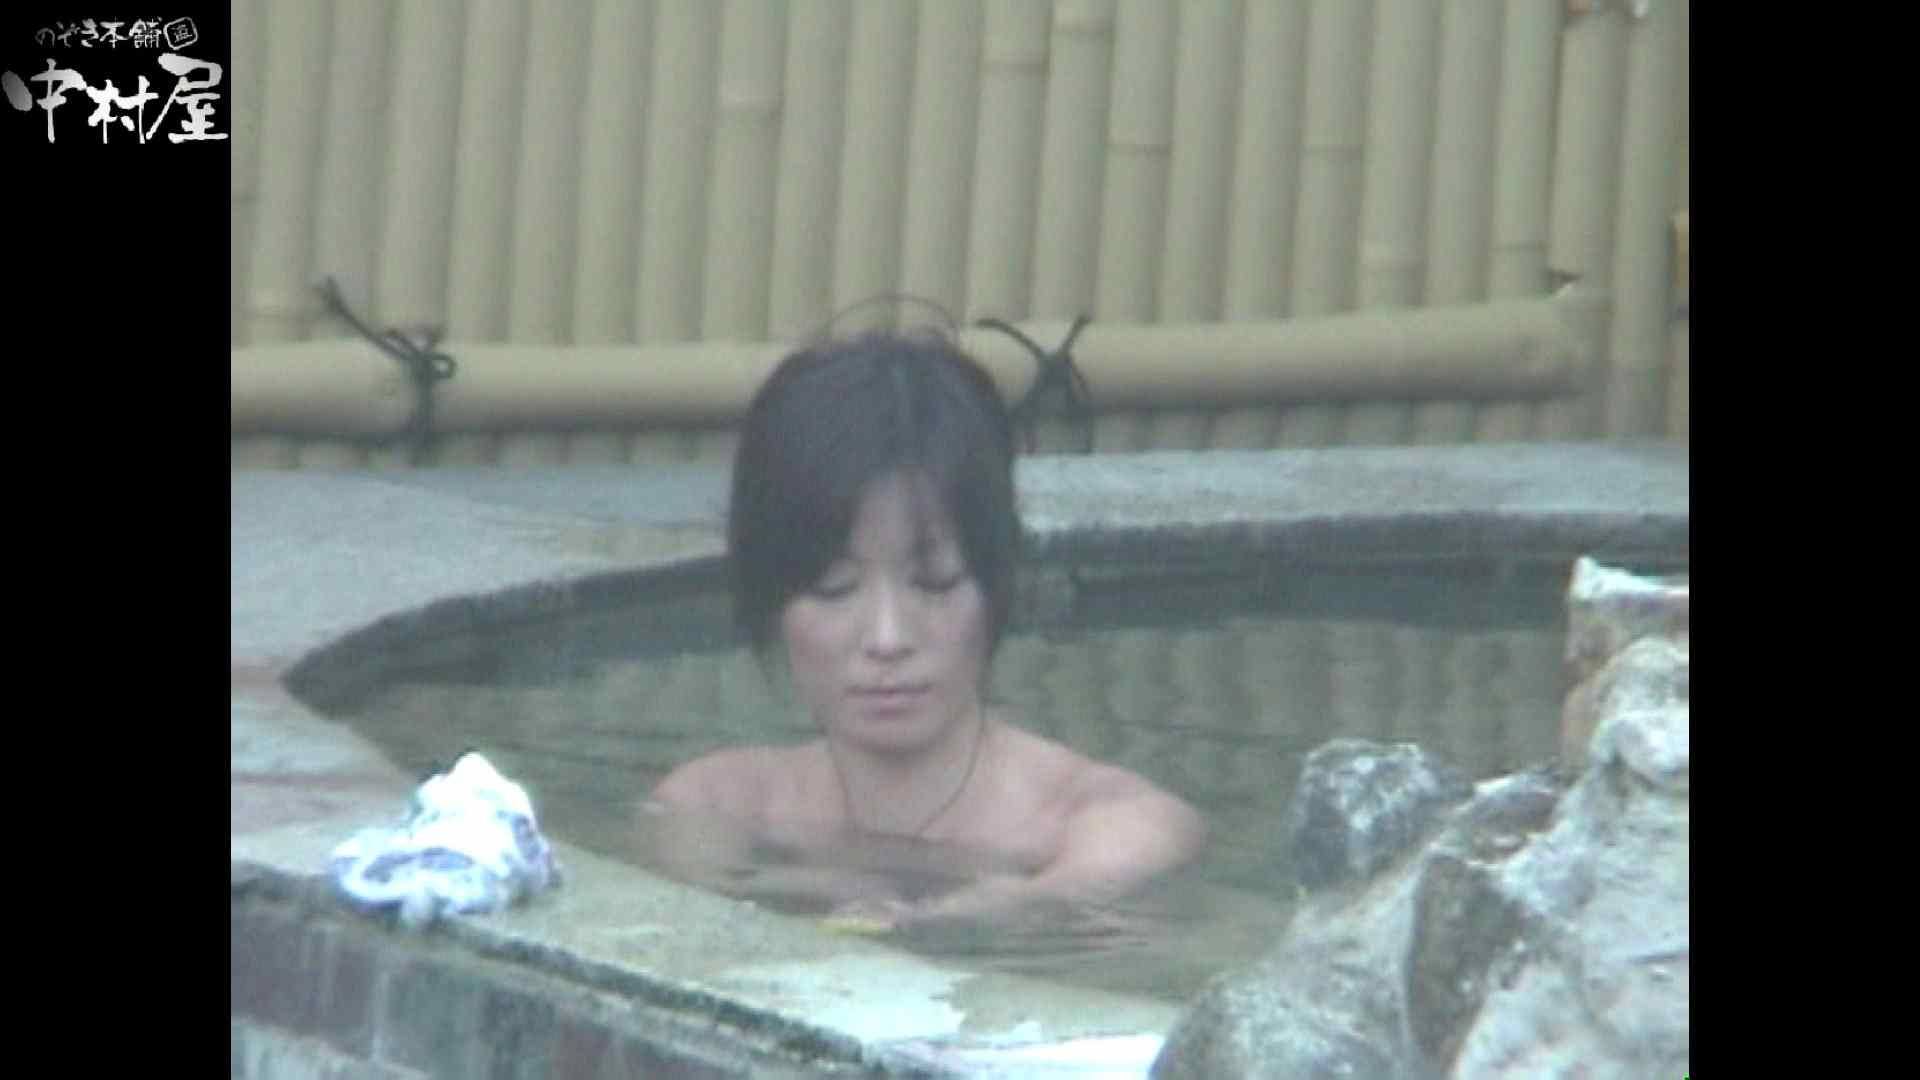 Aquaな露天風呂Vol.972 0  77連発 52